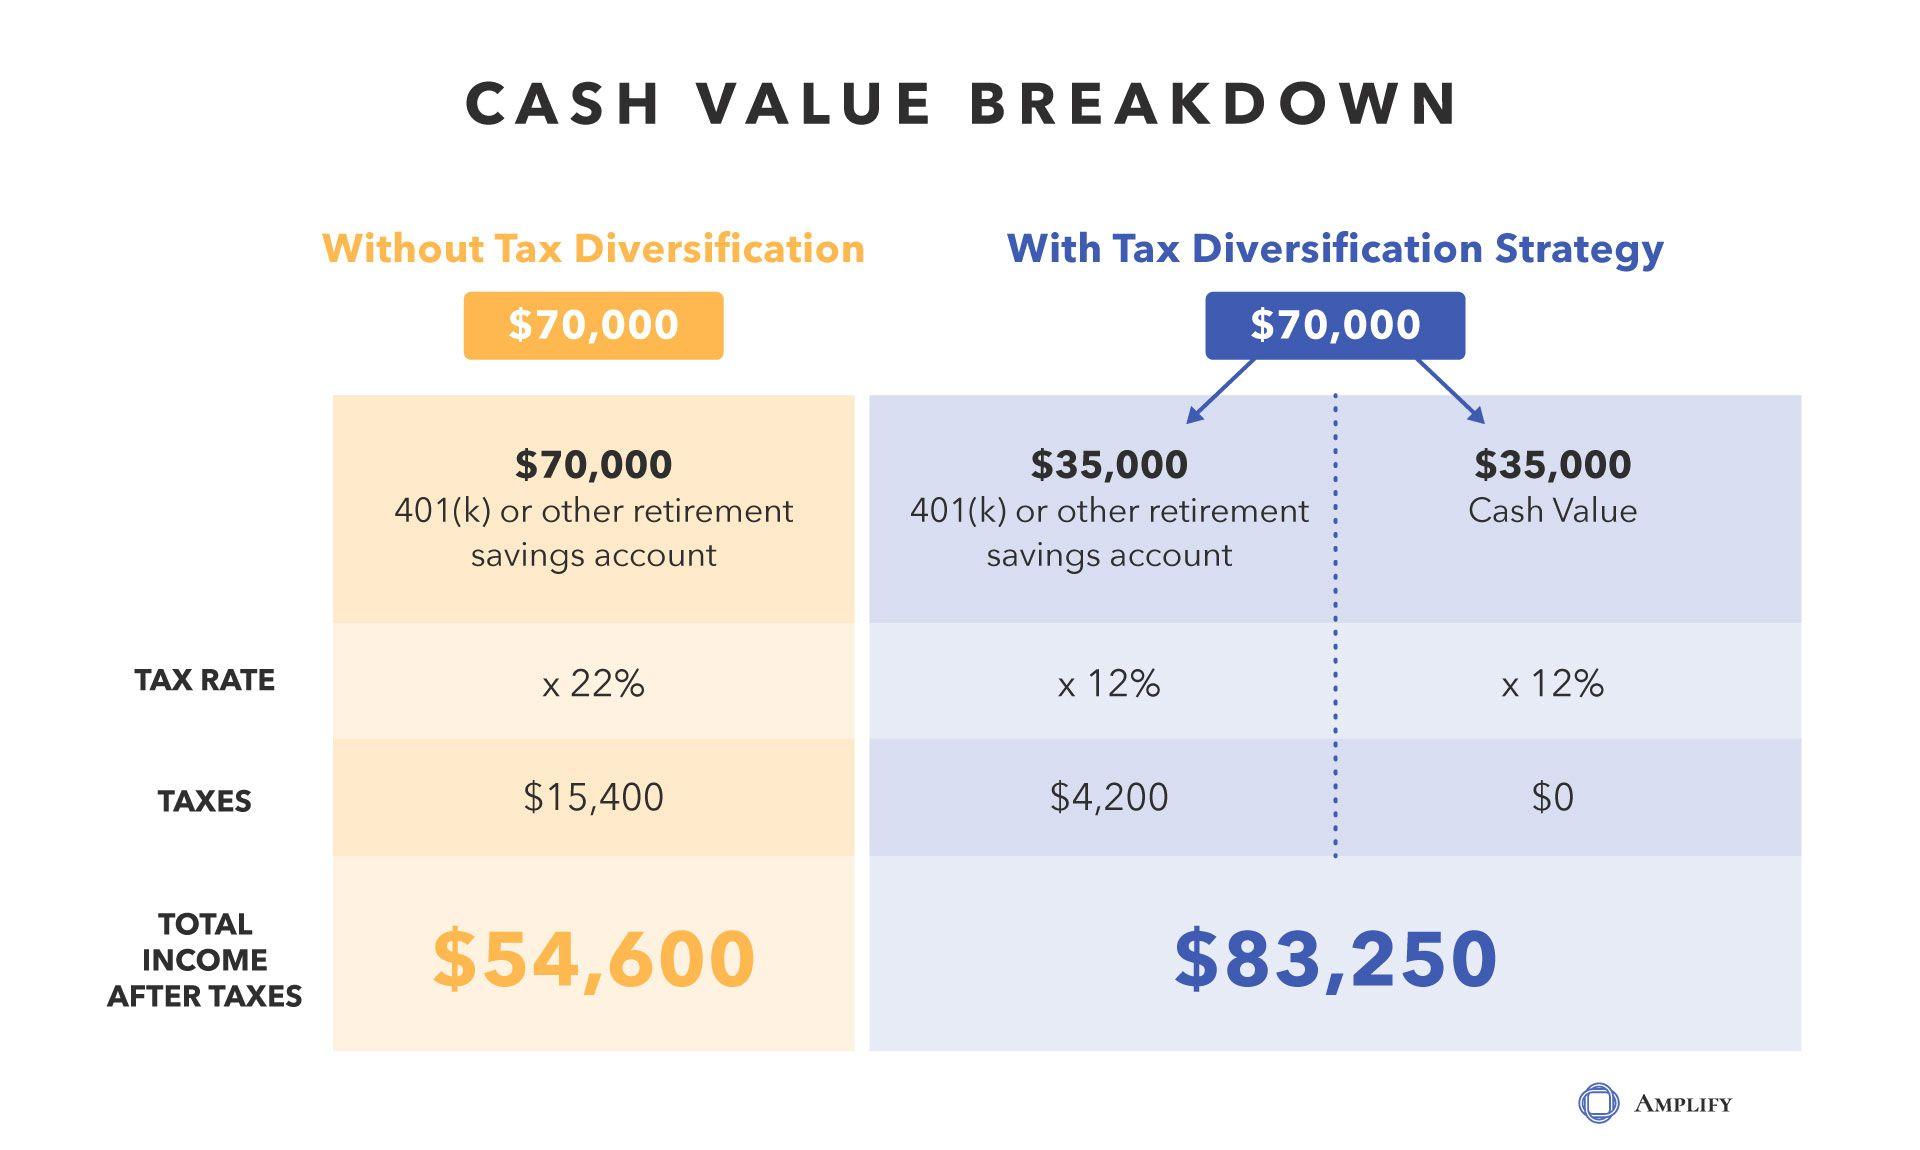 Amplify_Blog_Graphic-CashValueBreakdown.jpg